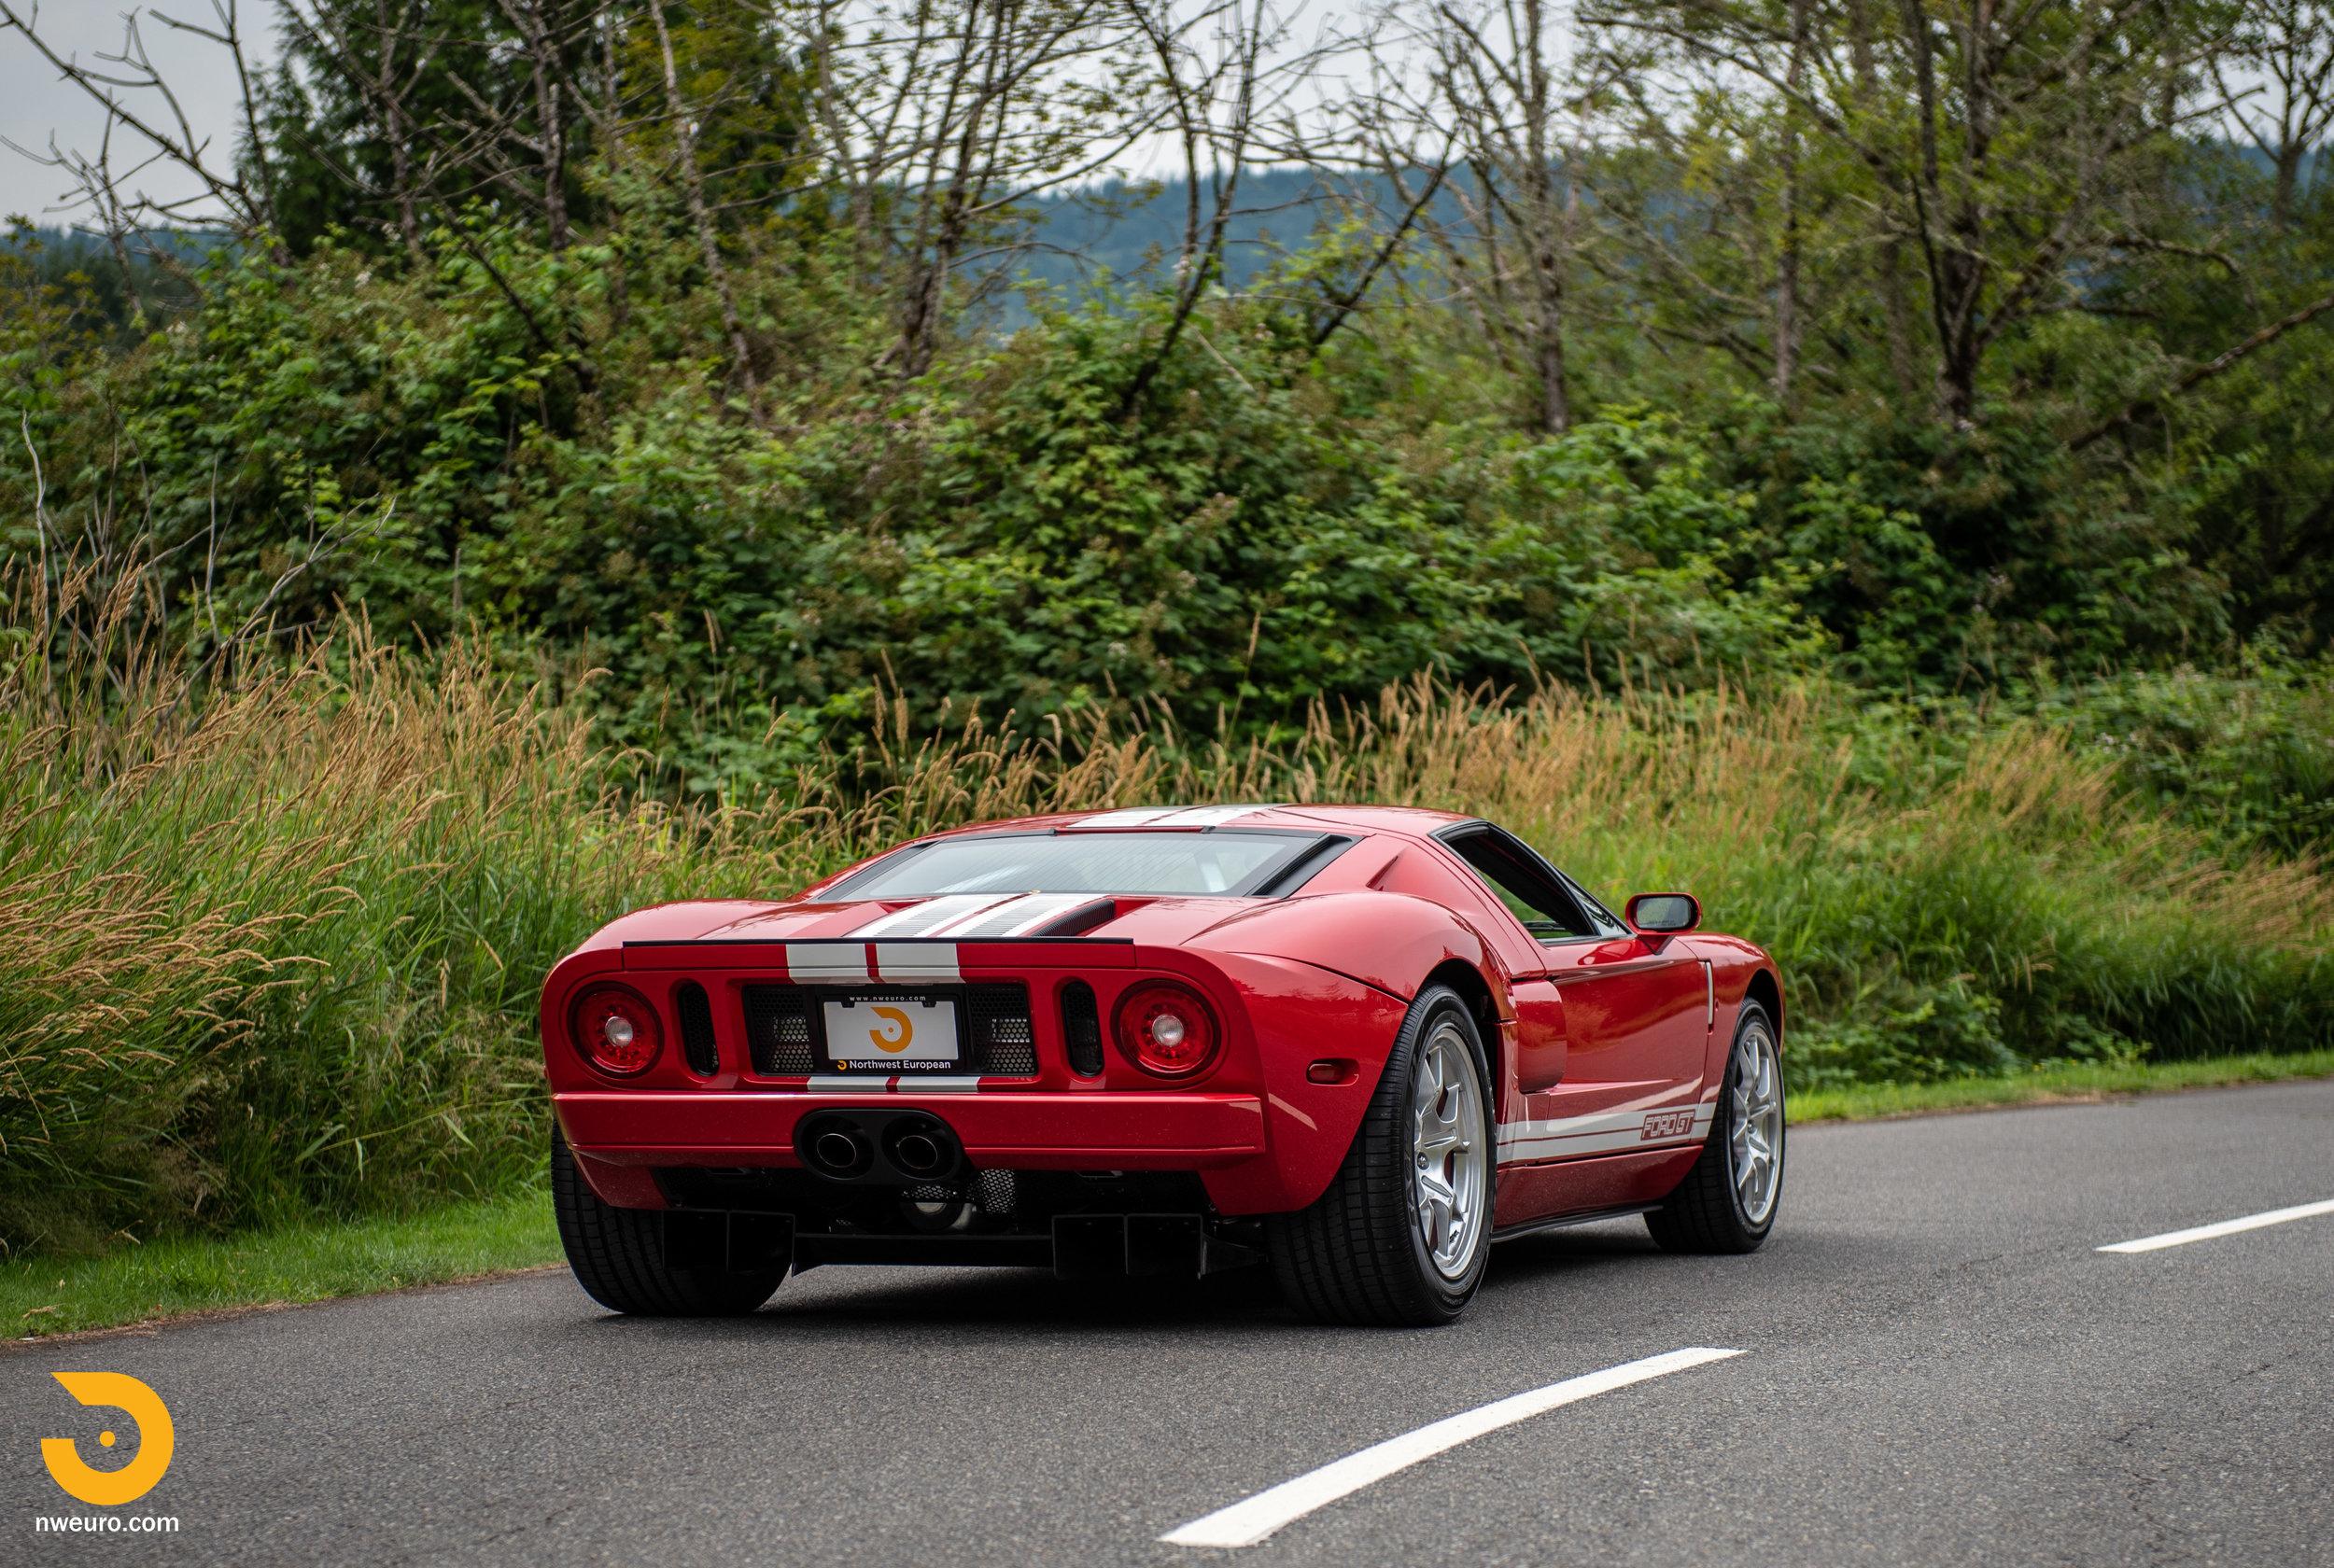 2005 Ford GT Red-83.jpg